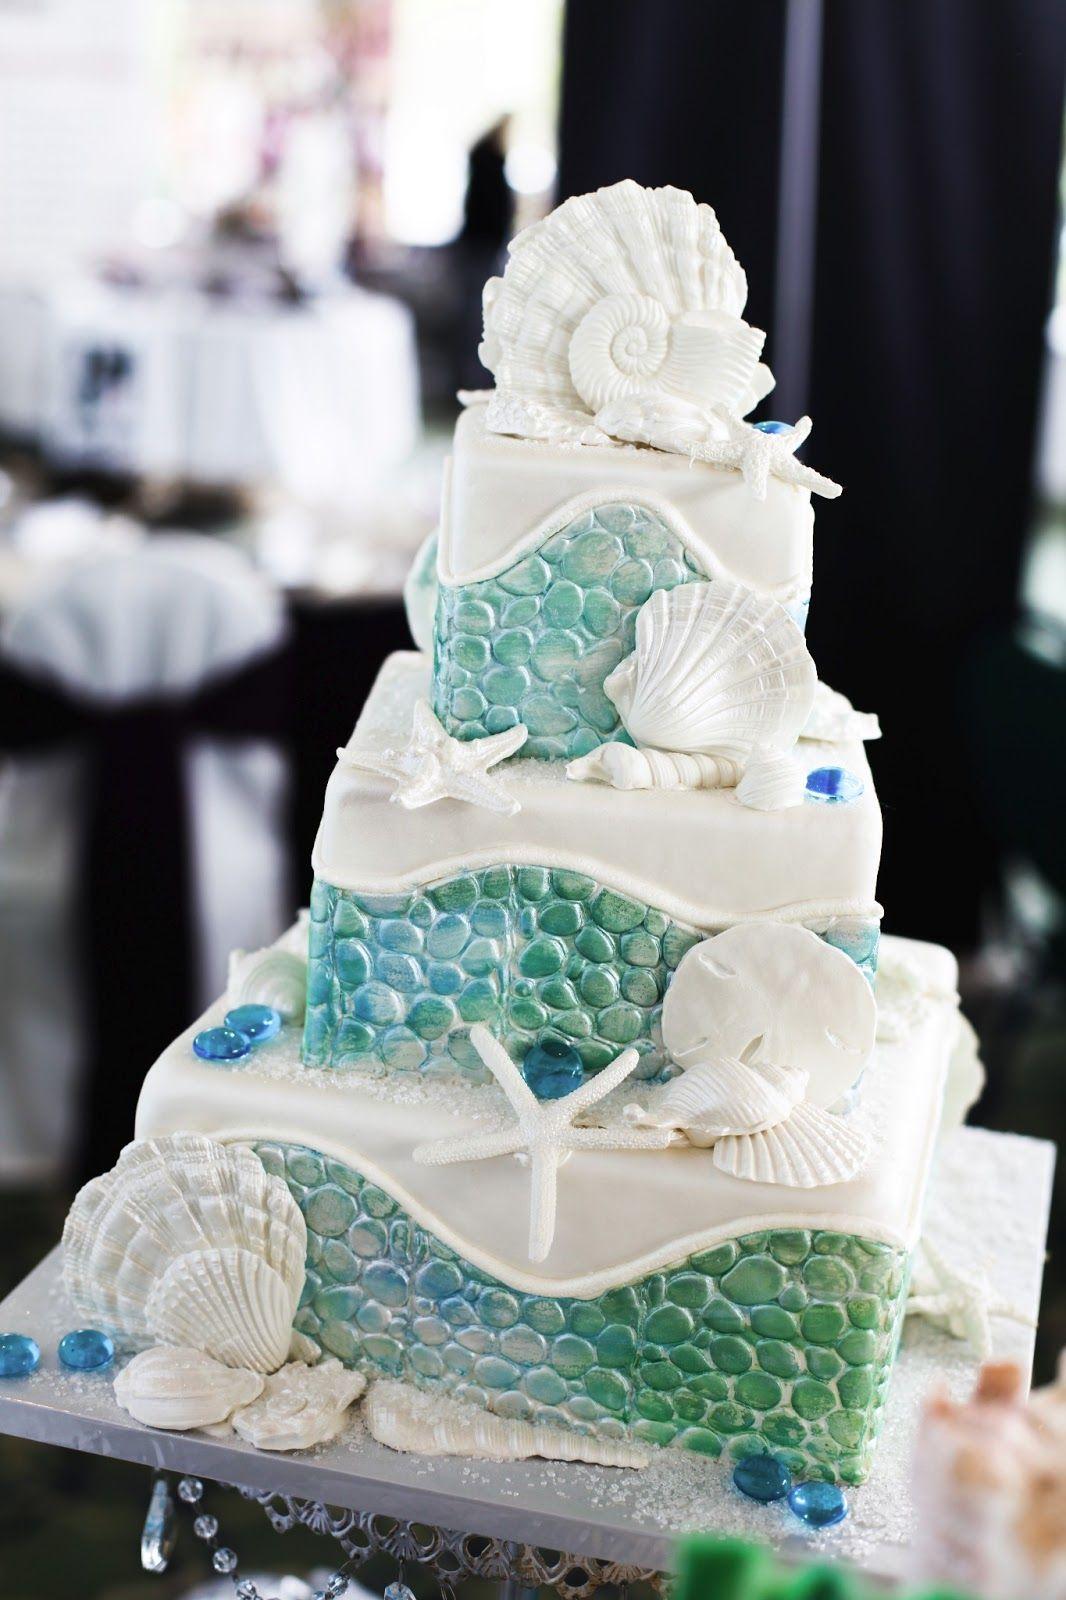 Seascapes Cake Pixelart Photography Cakes By Ron Sarasota Fl